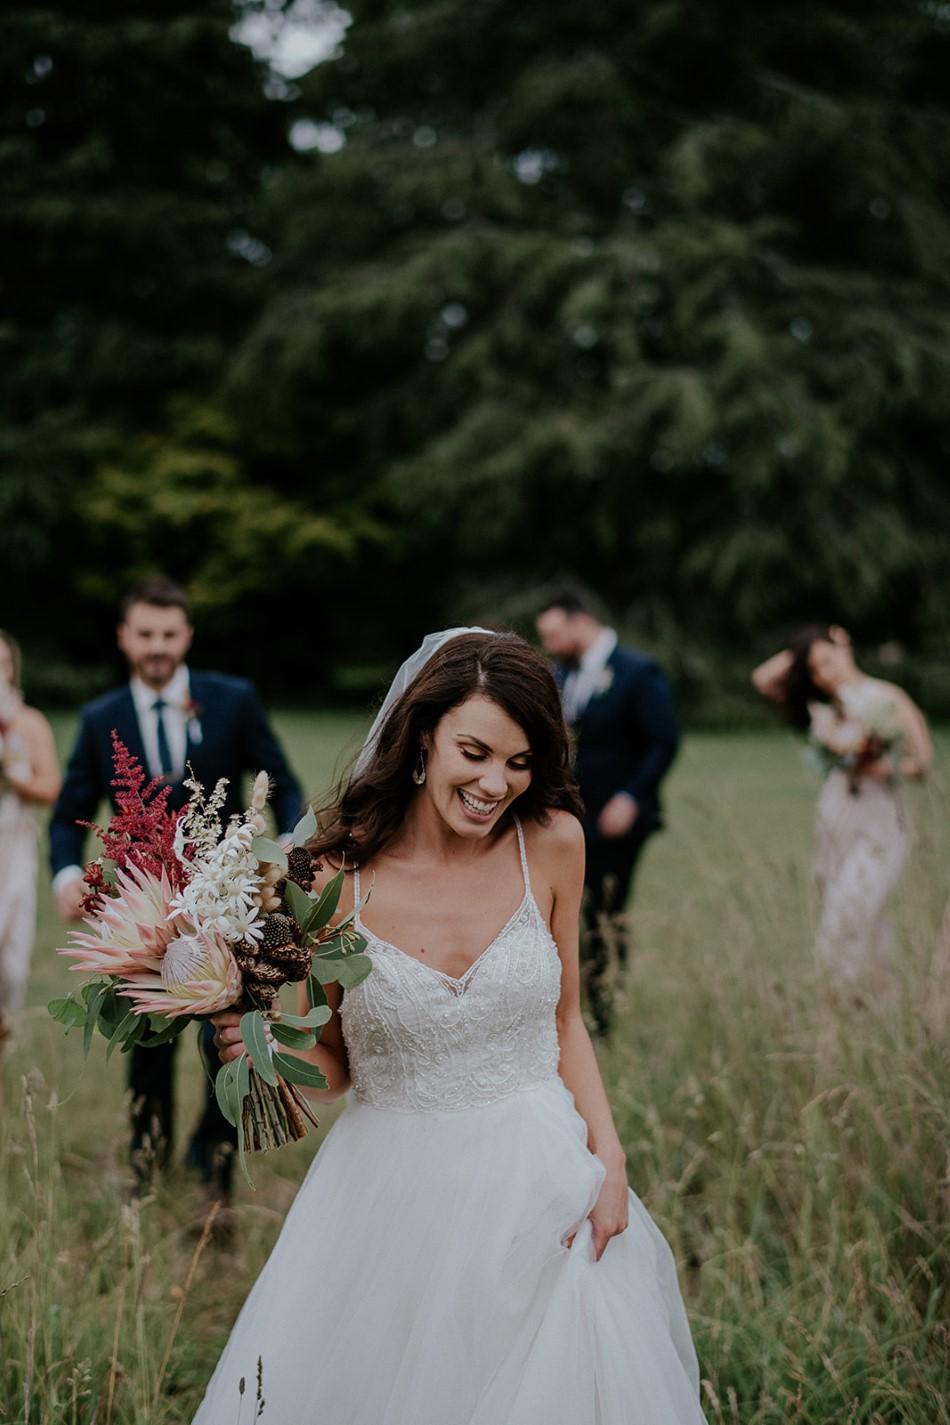 monique lawler makeup_shireshirewedding.com (10).jpg